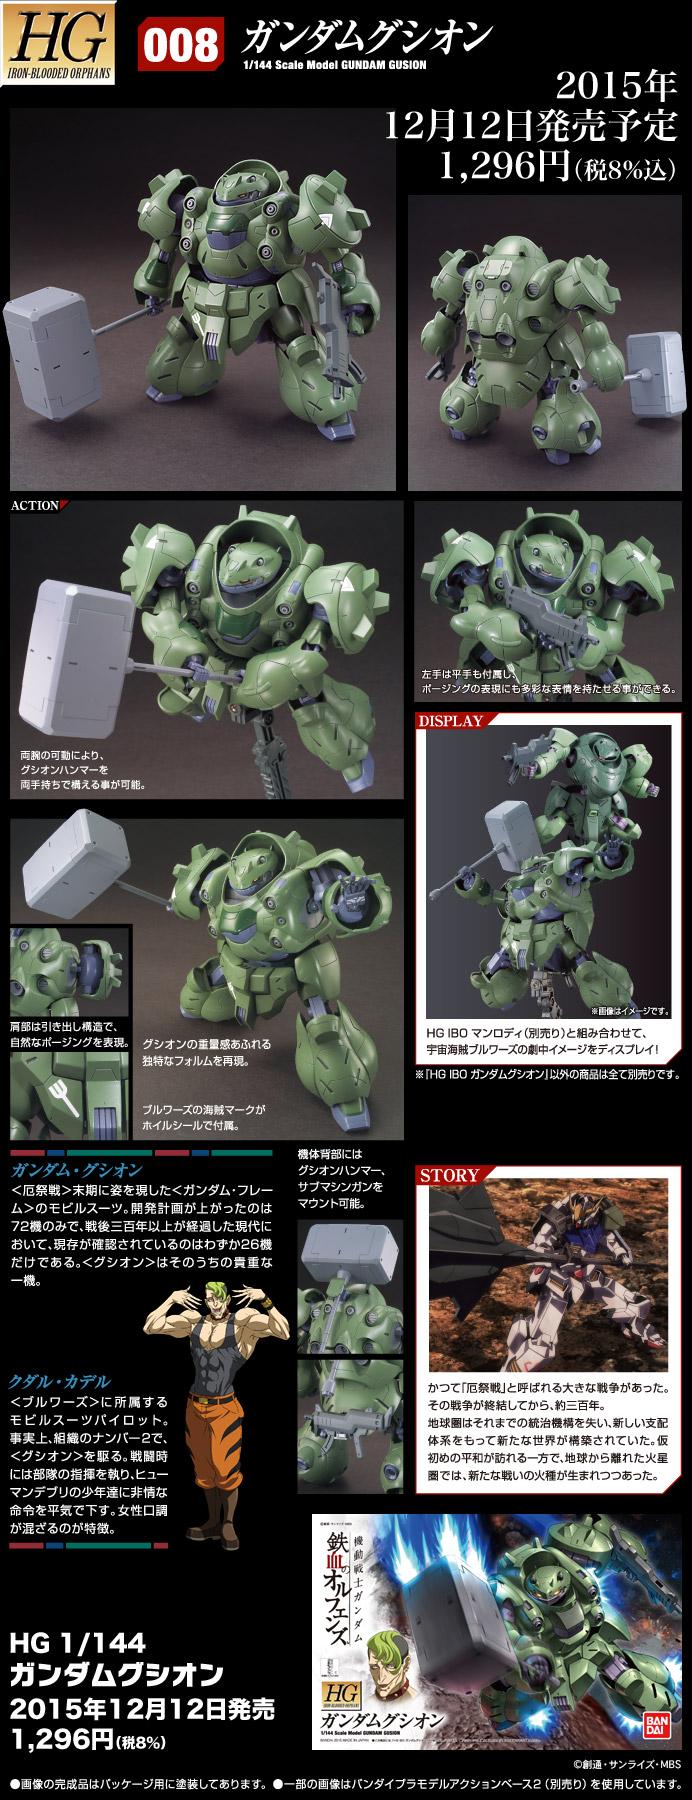 HG 1/144 ASW-G-11 ガンダムグシオン 公式商品説明(画像)